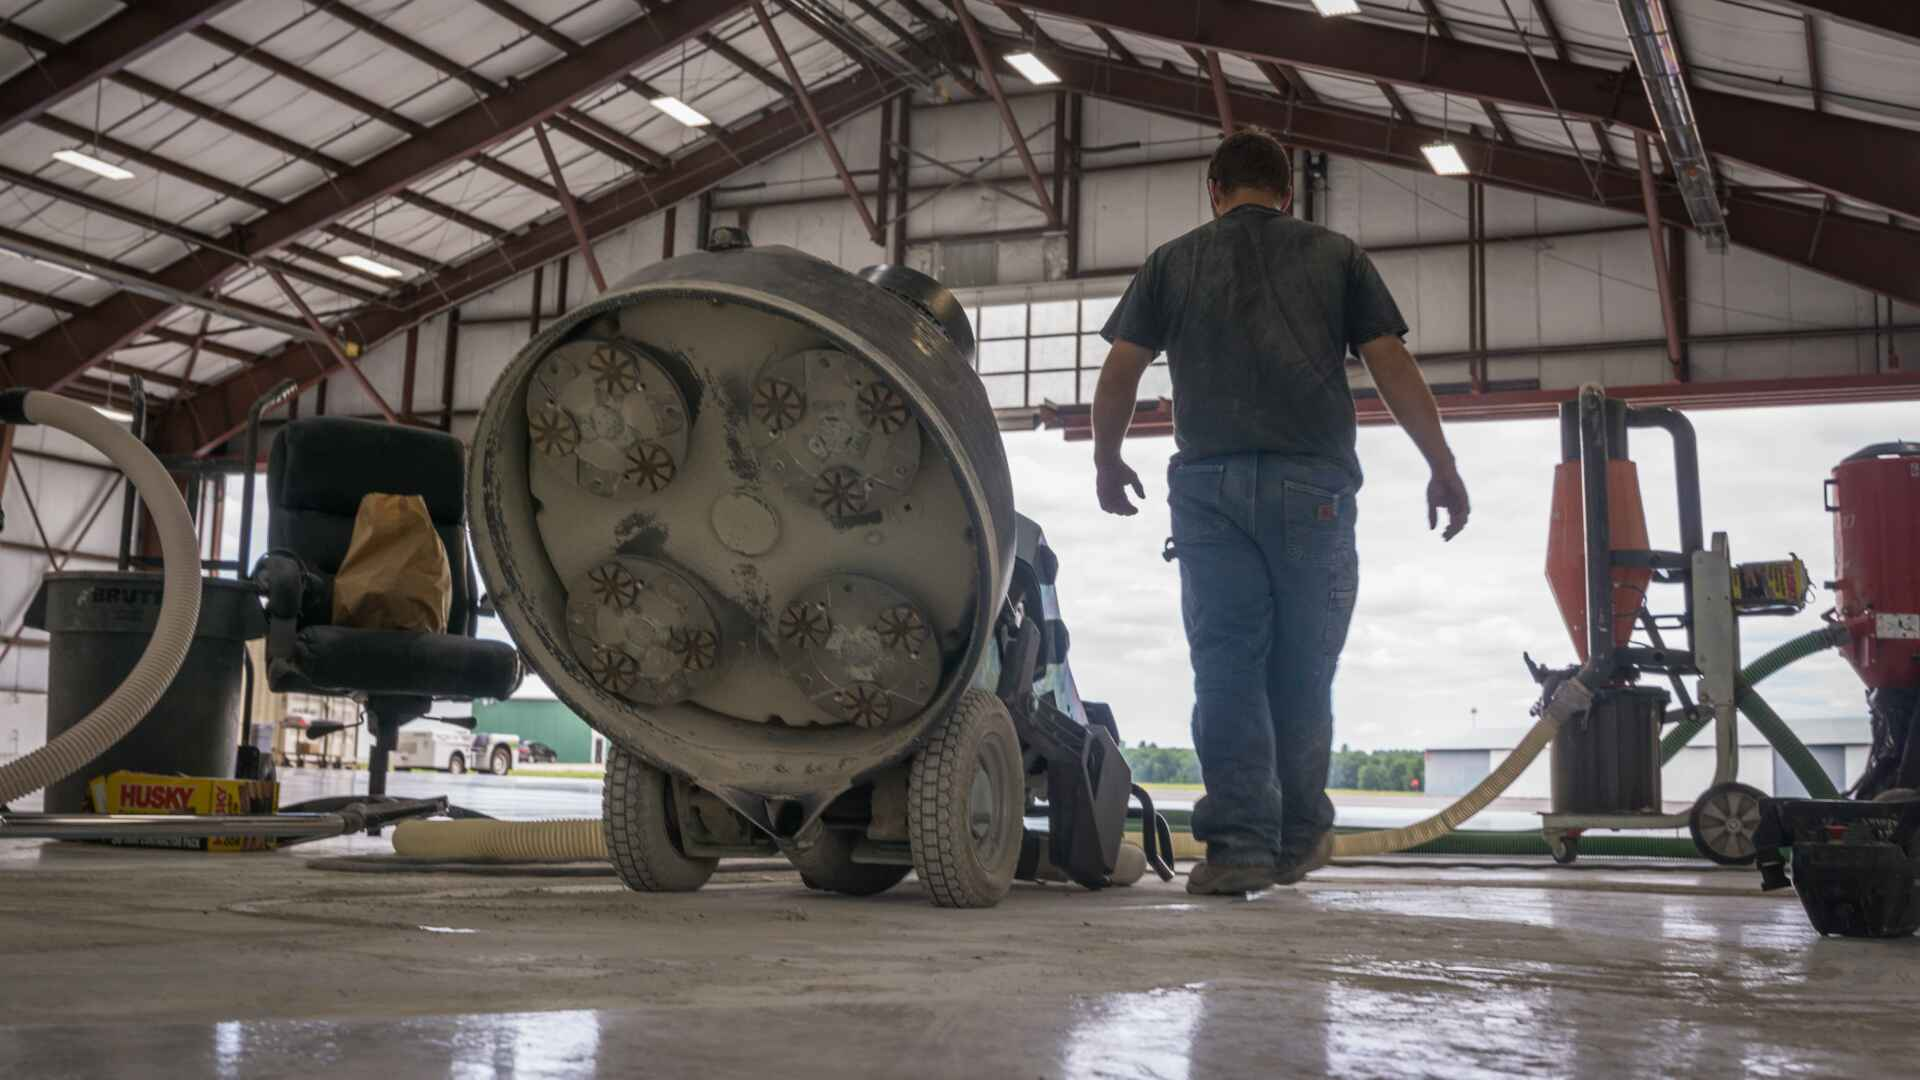 Nashua Aircraft Hangar. Epoxy Removal Job.